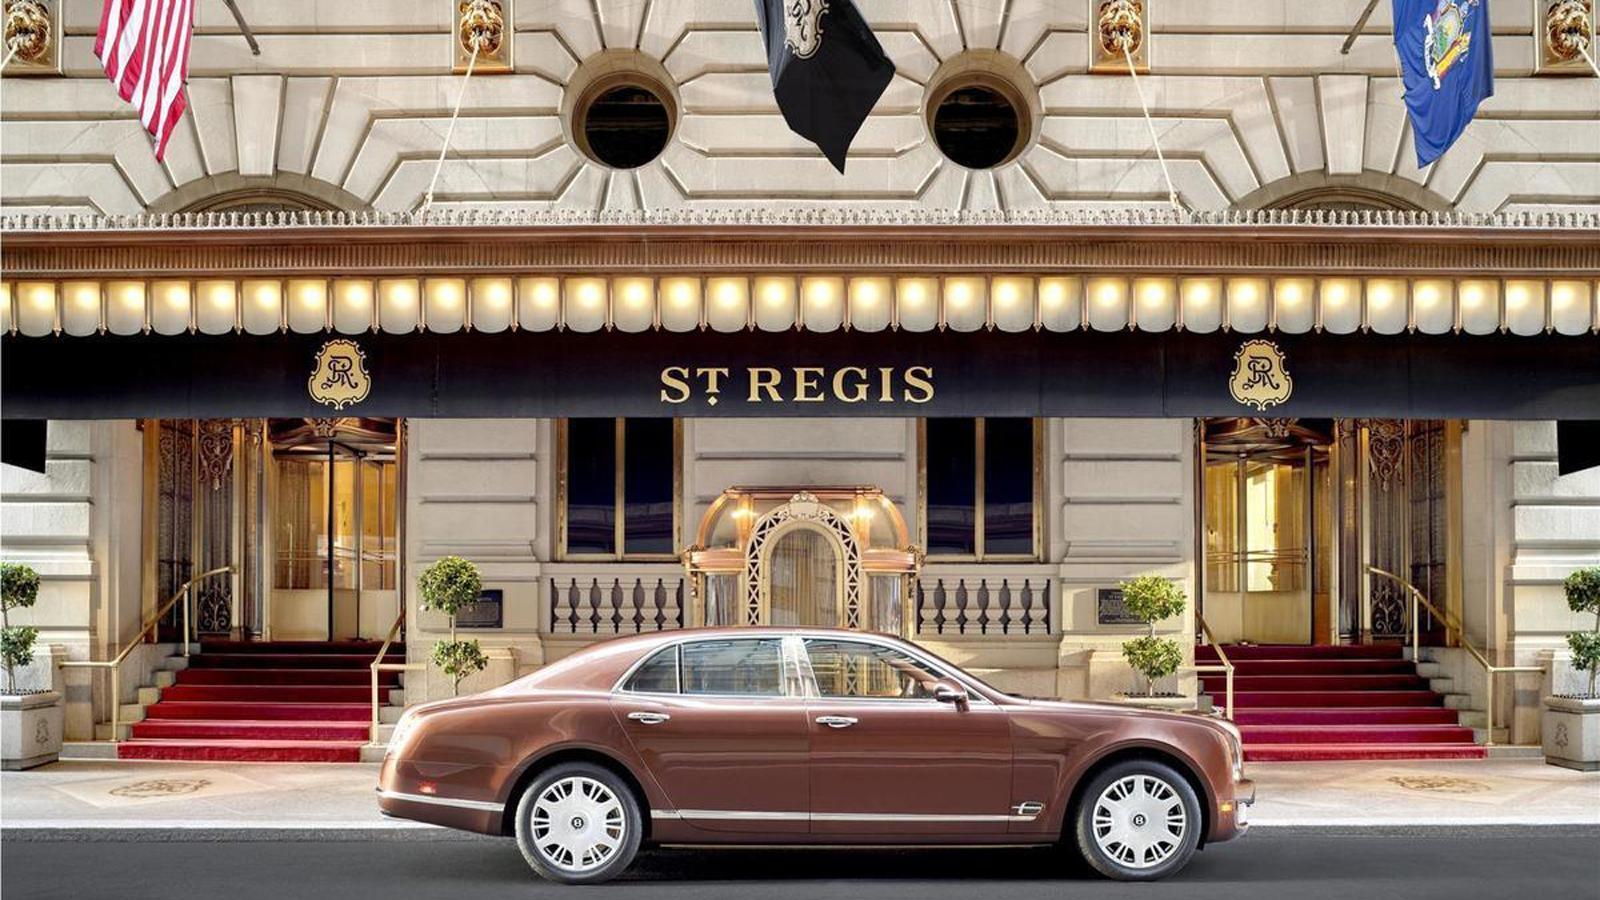 The St. Regis, 2 East 55th Street